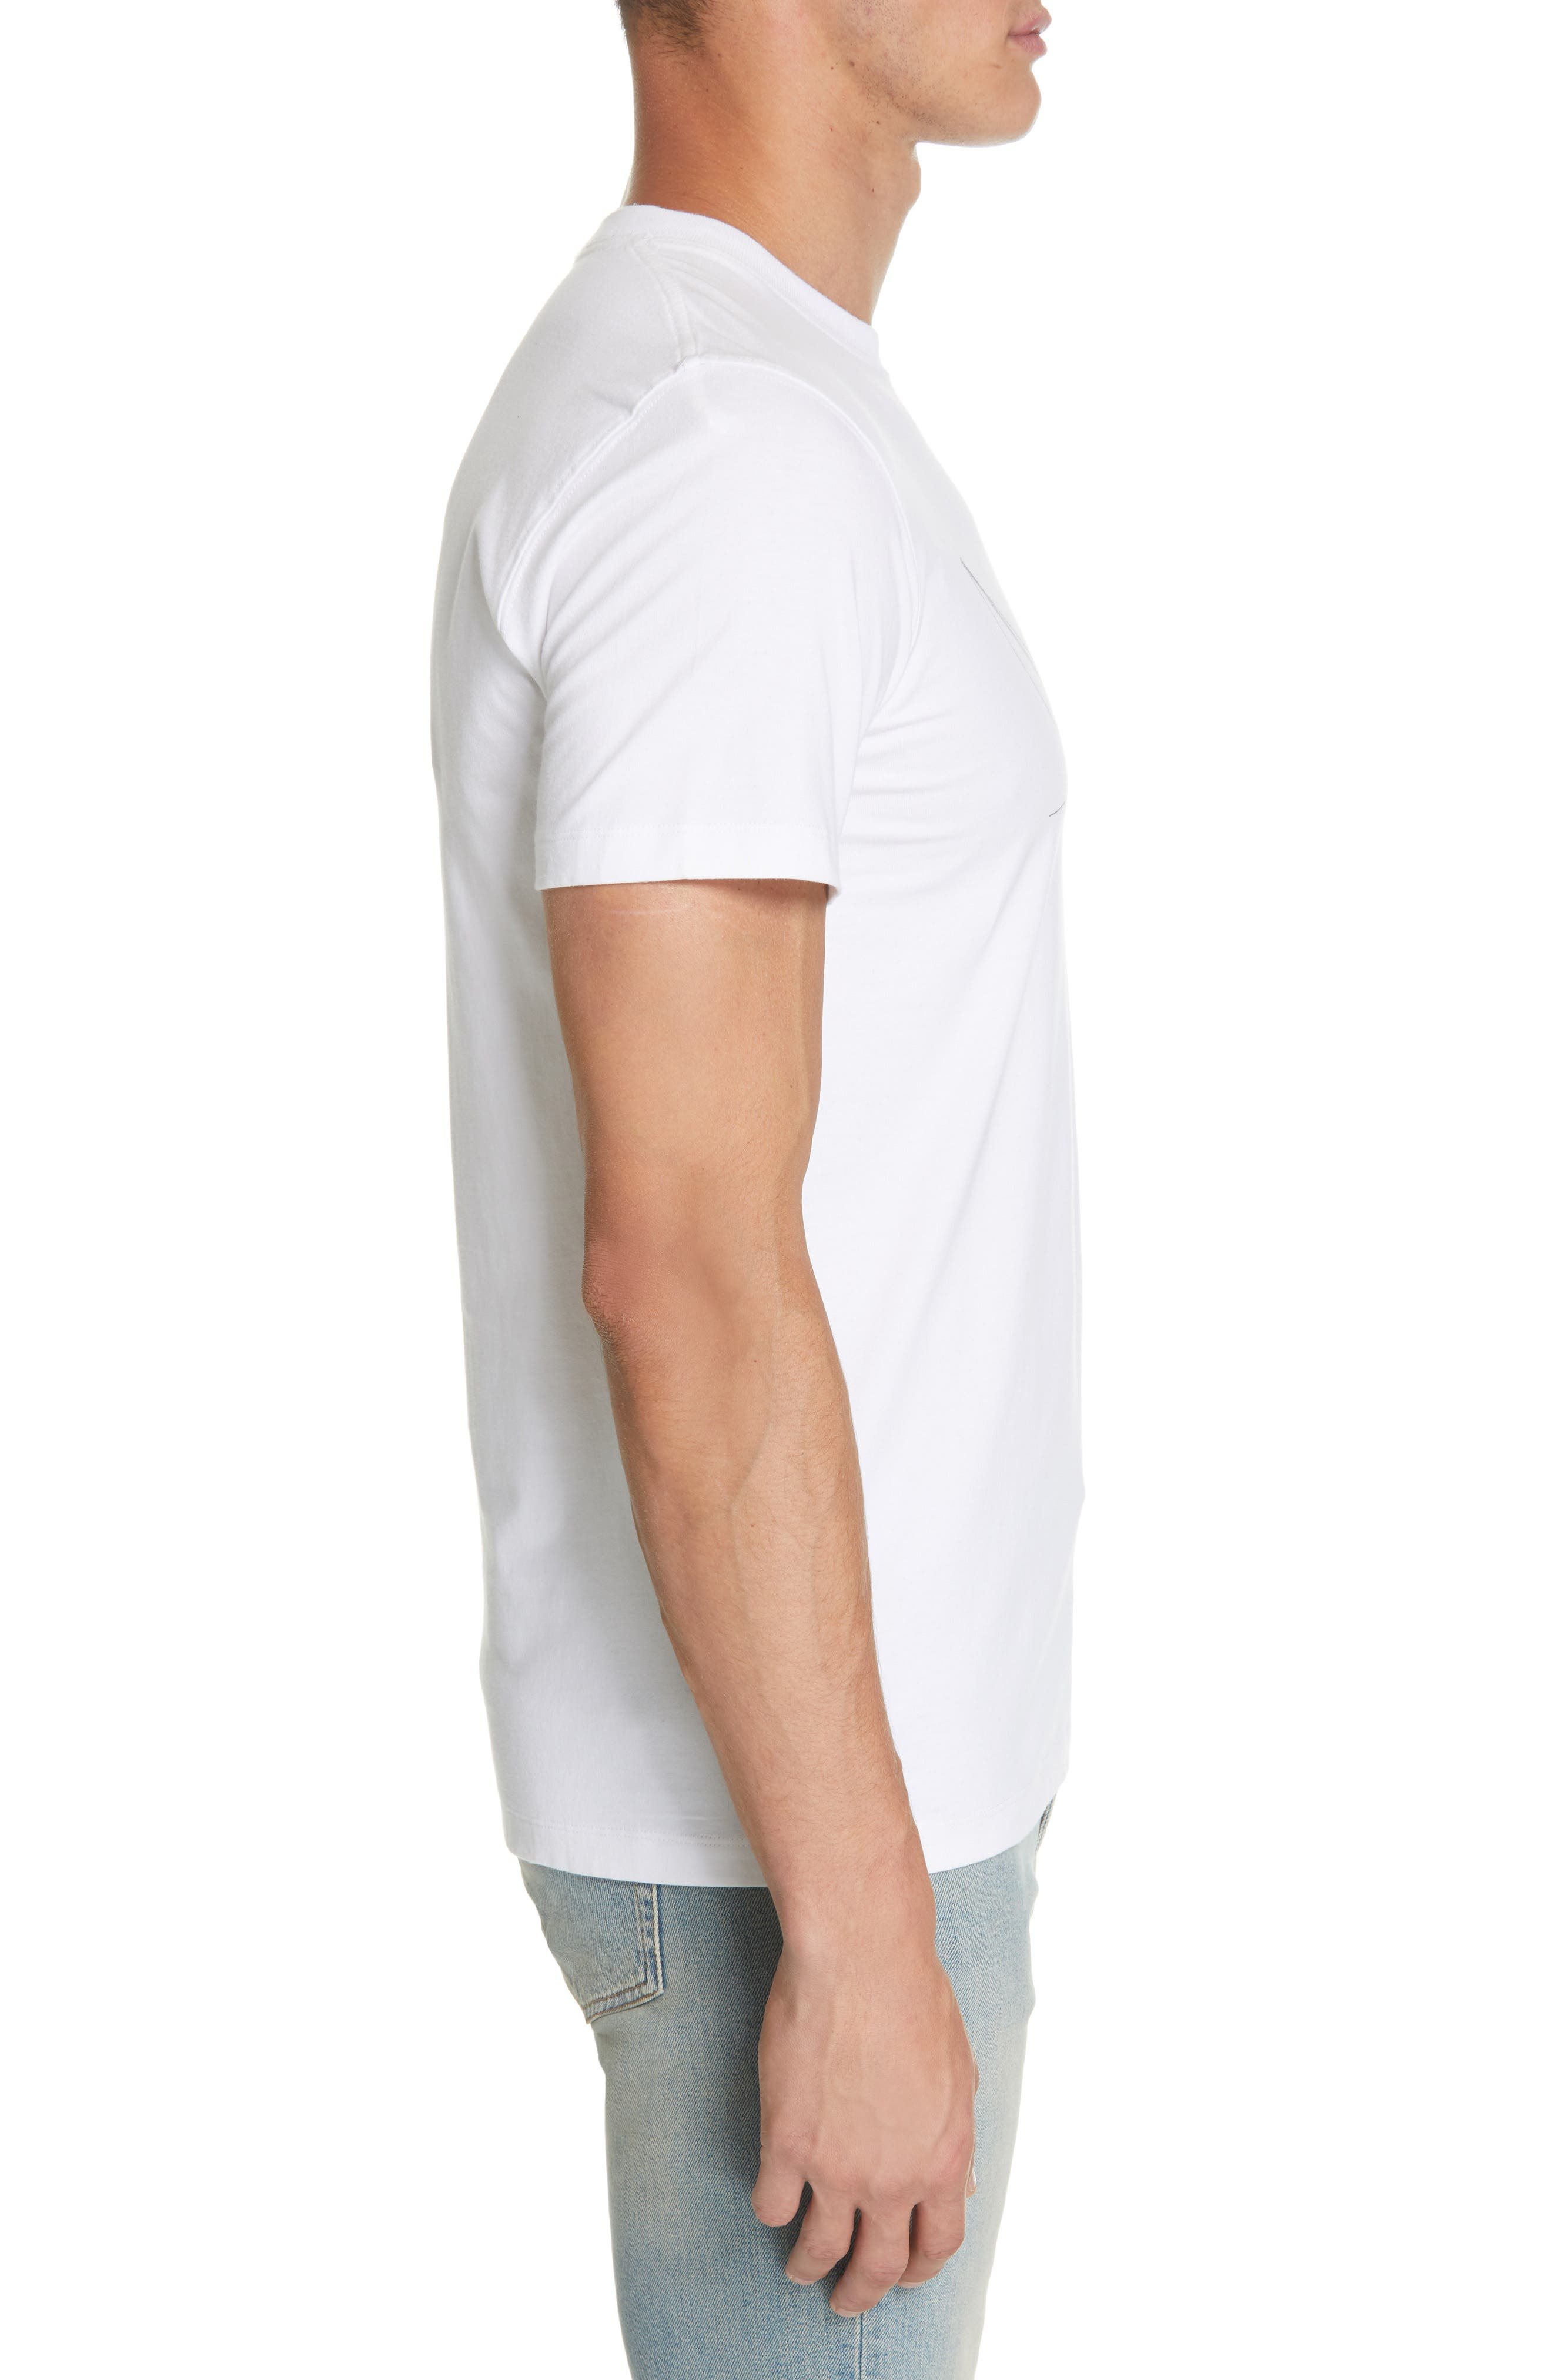 Daniel Frost - Hanging Graphic T-Shirt,                             Alternate thumbnail 3, color,                             WHITE